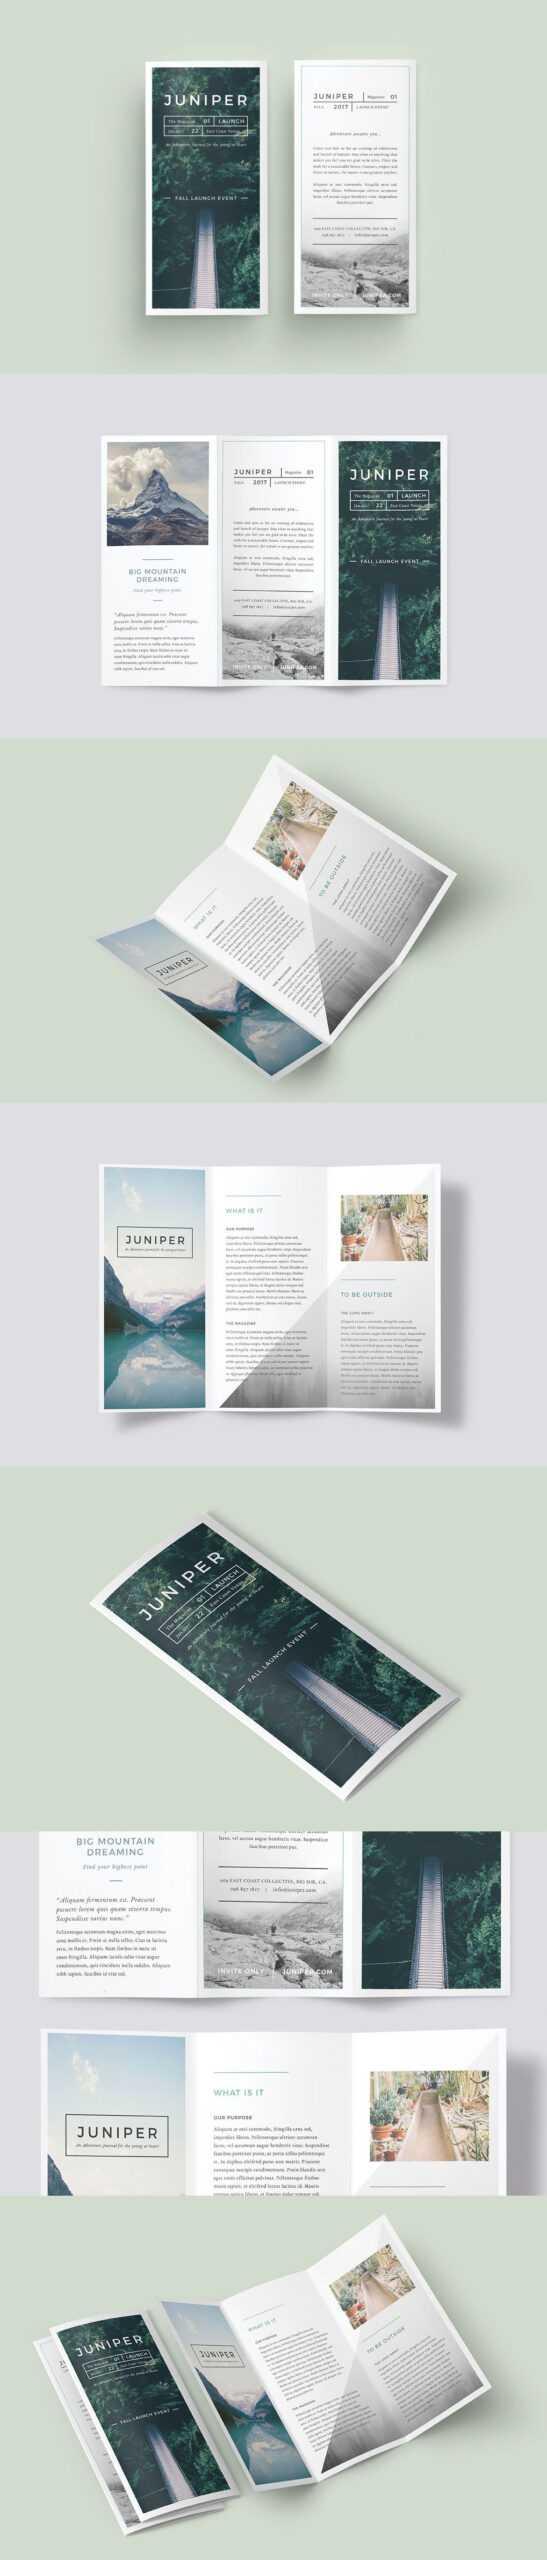 A Beautiful Multipurpose Tri-Fold Dl Brochure Template throughout Tri Fold Brochure Template Indesign Free Download